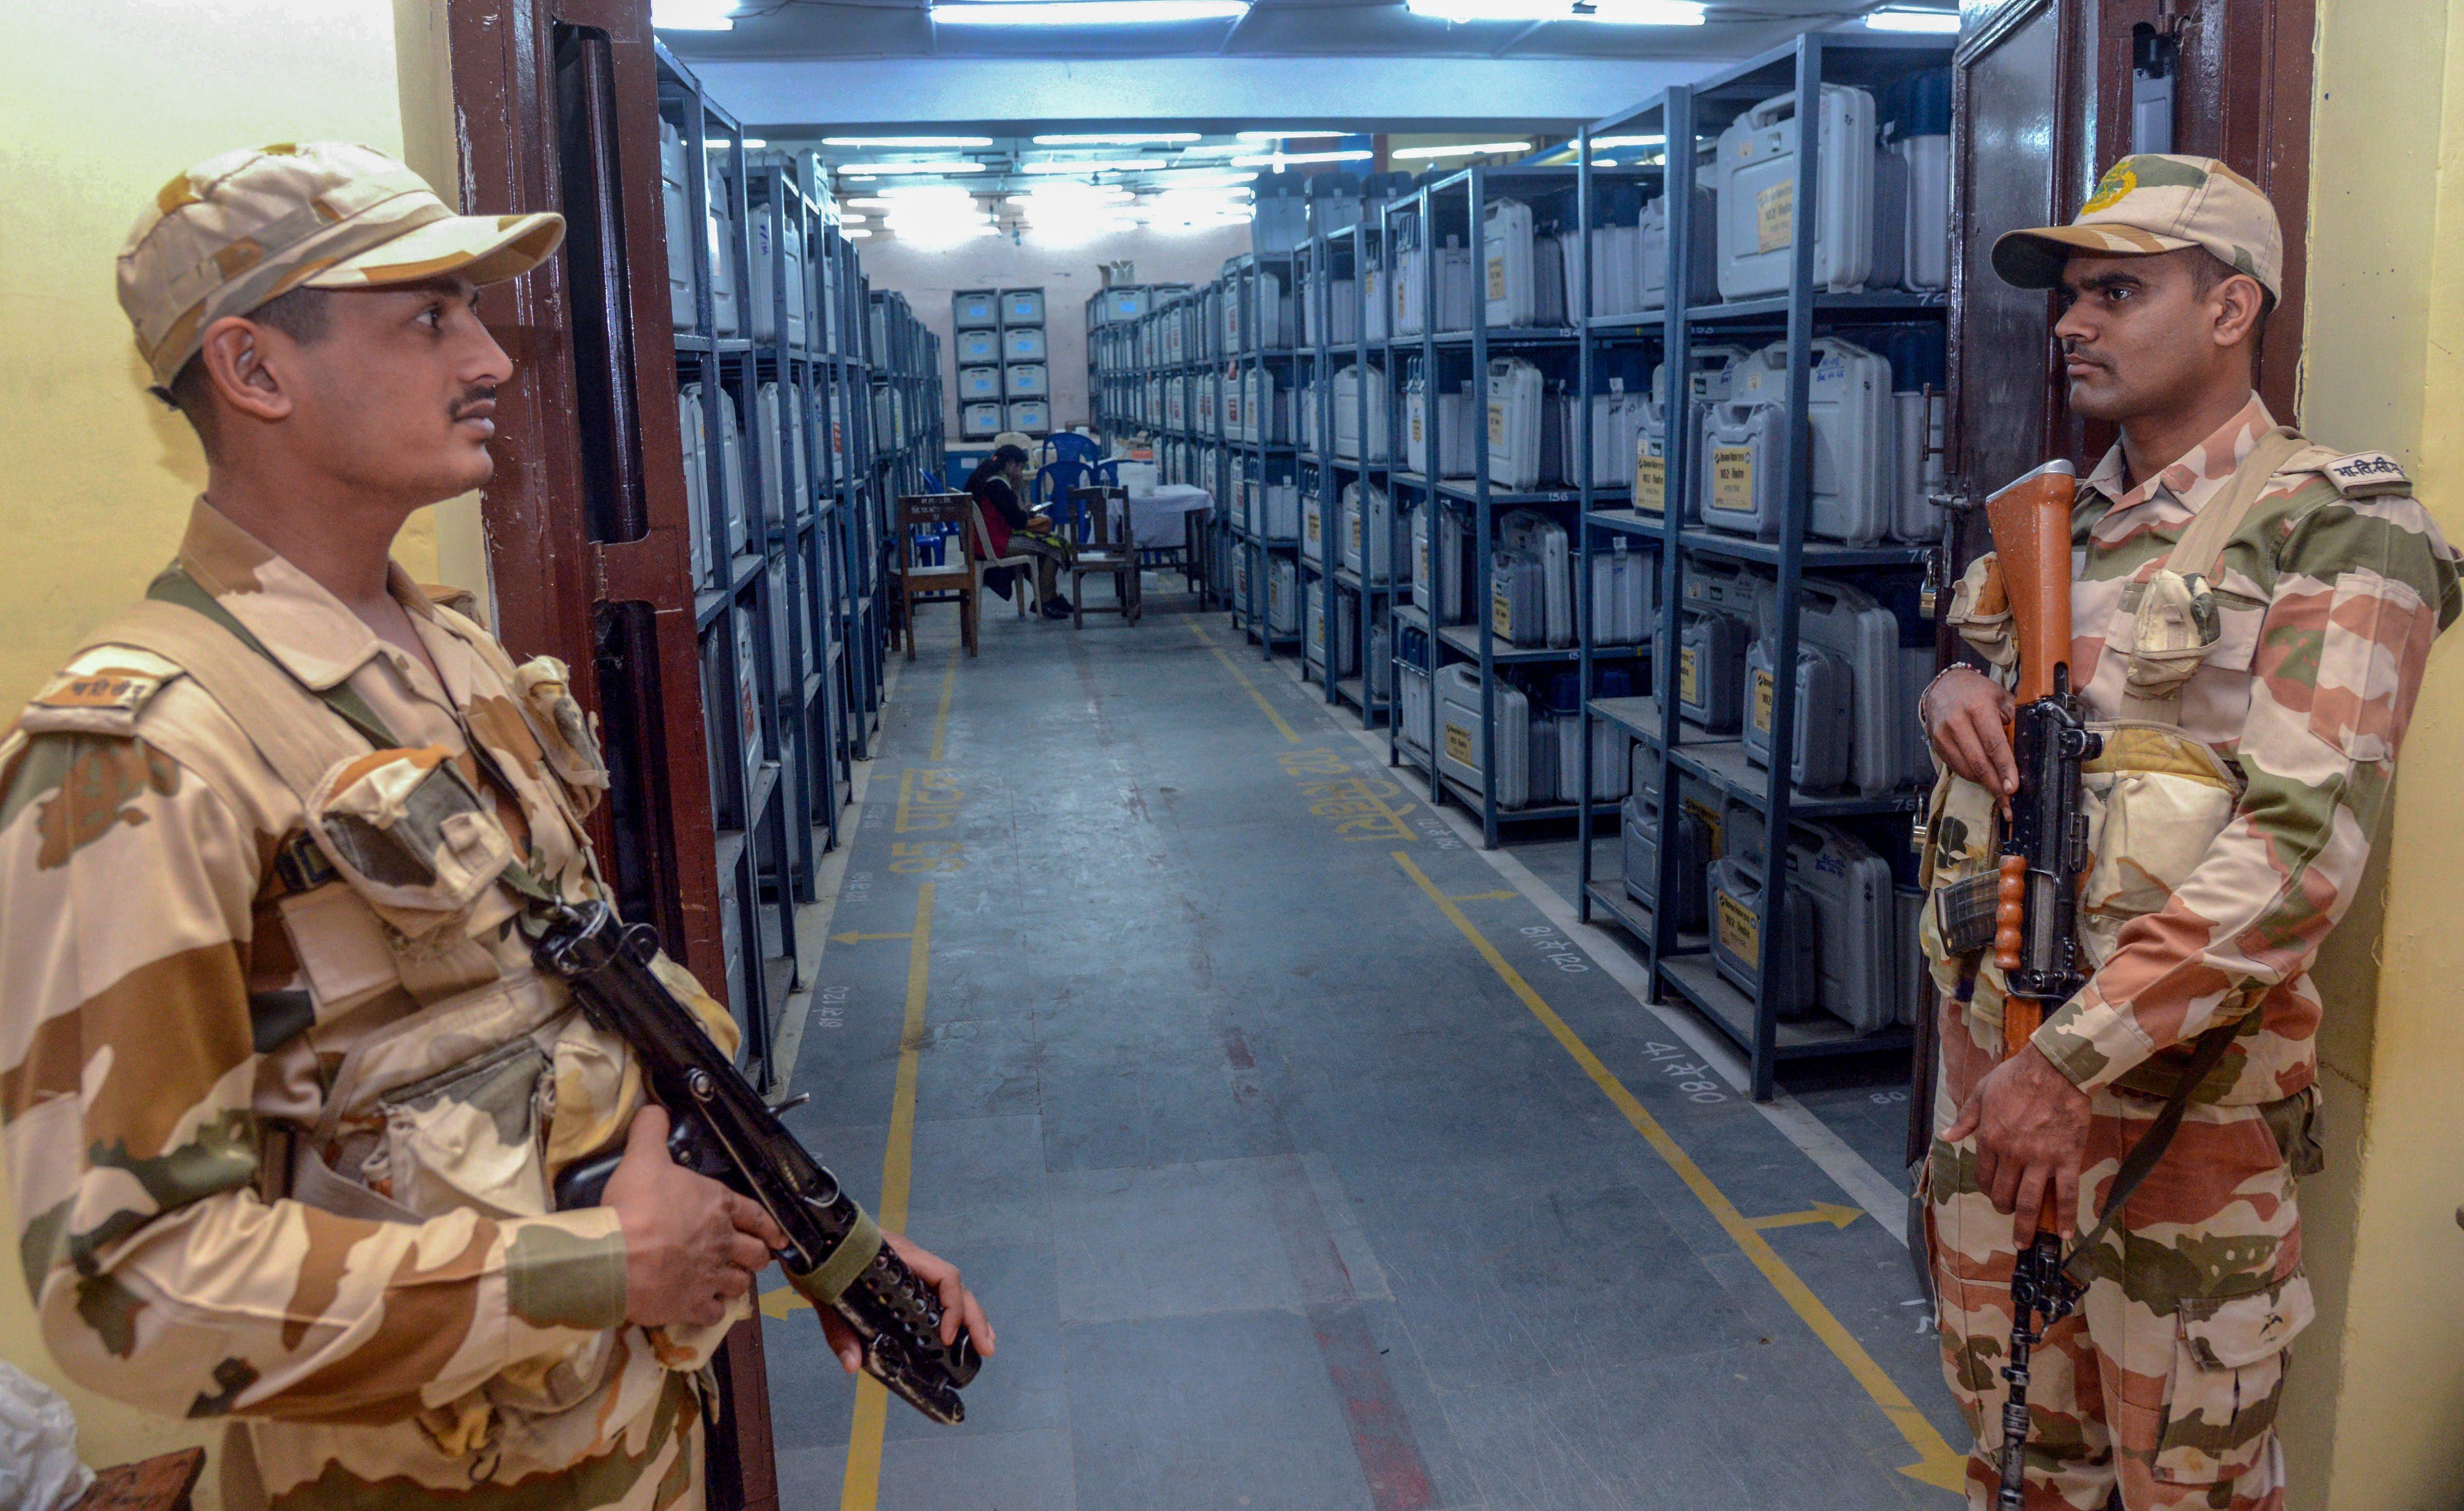 Indo-Tibetan Border Police guards keep an eye on EVMs in Jabalpur, Madhya Pradesh. The state votes on November 28